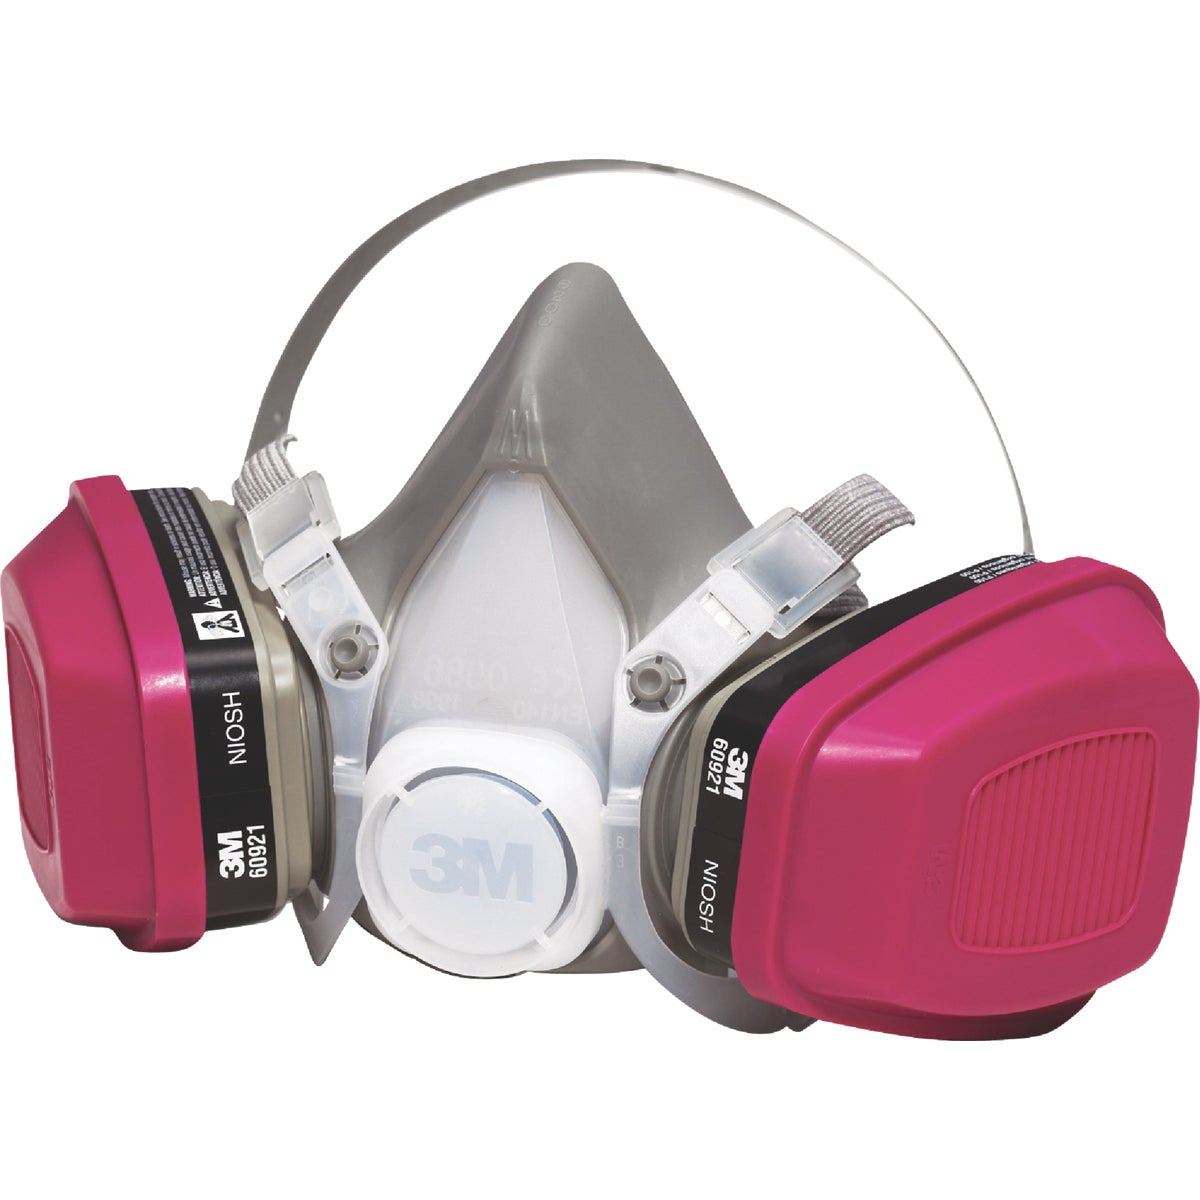 3M OV/P100 Household Multi-Purpose Respirator